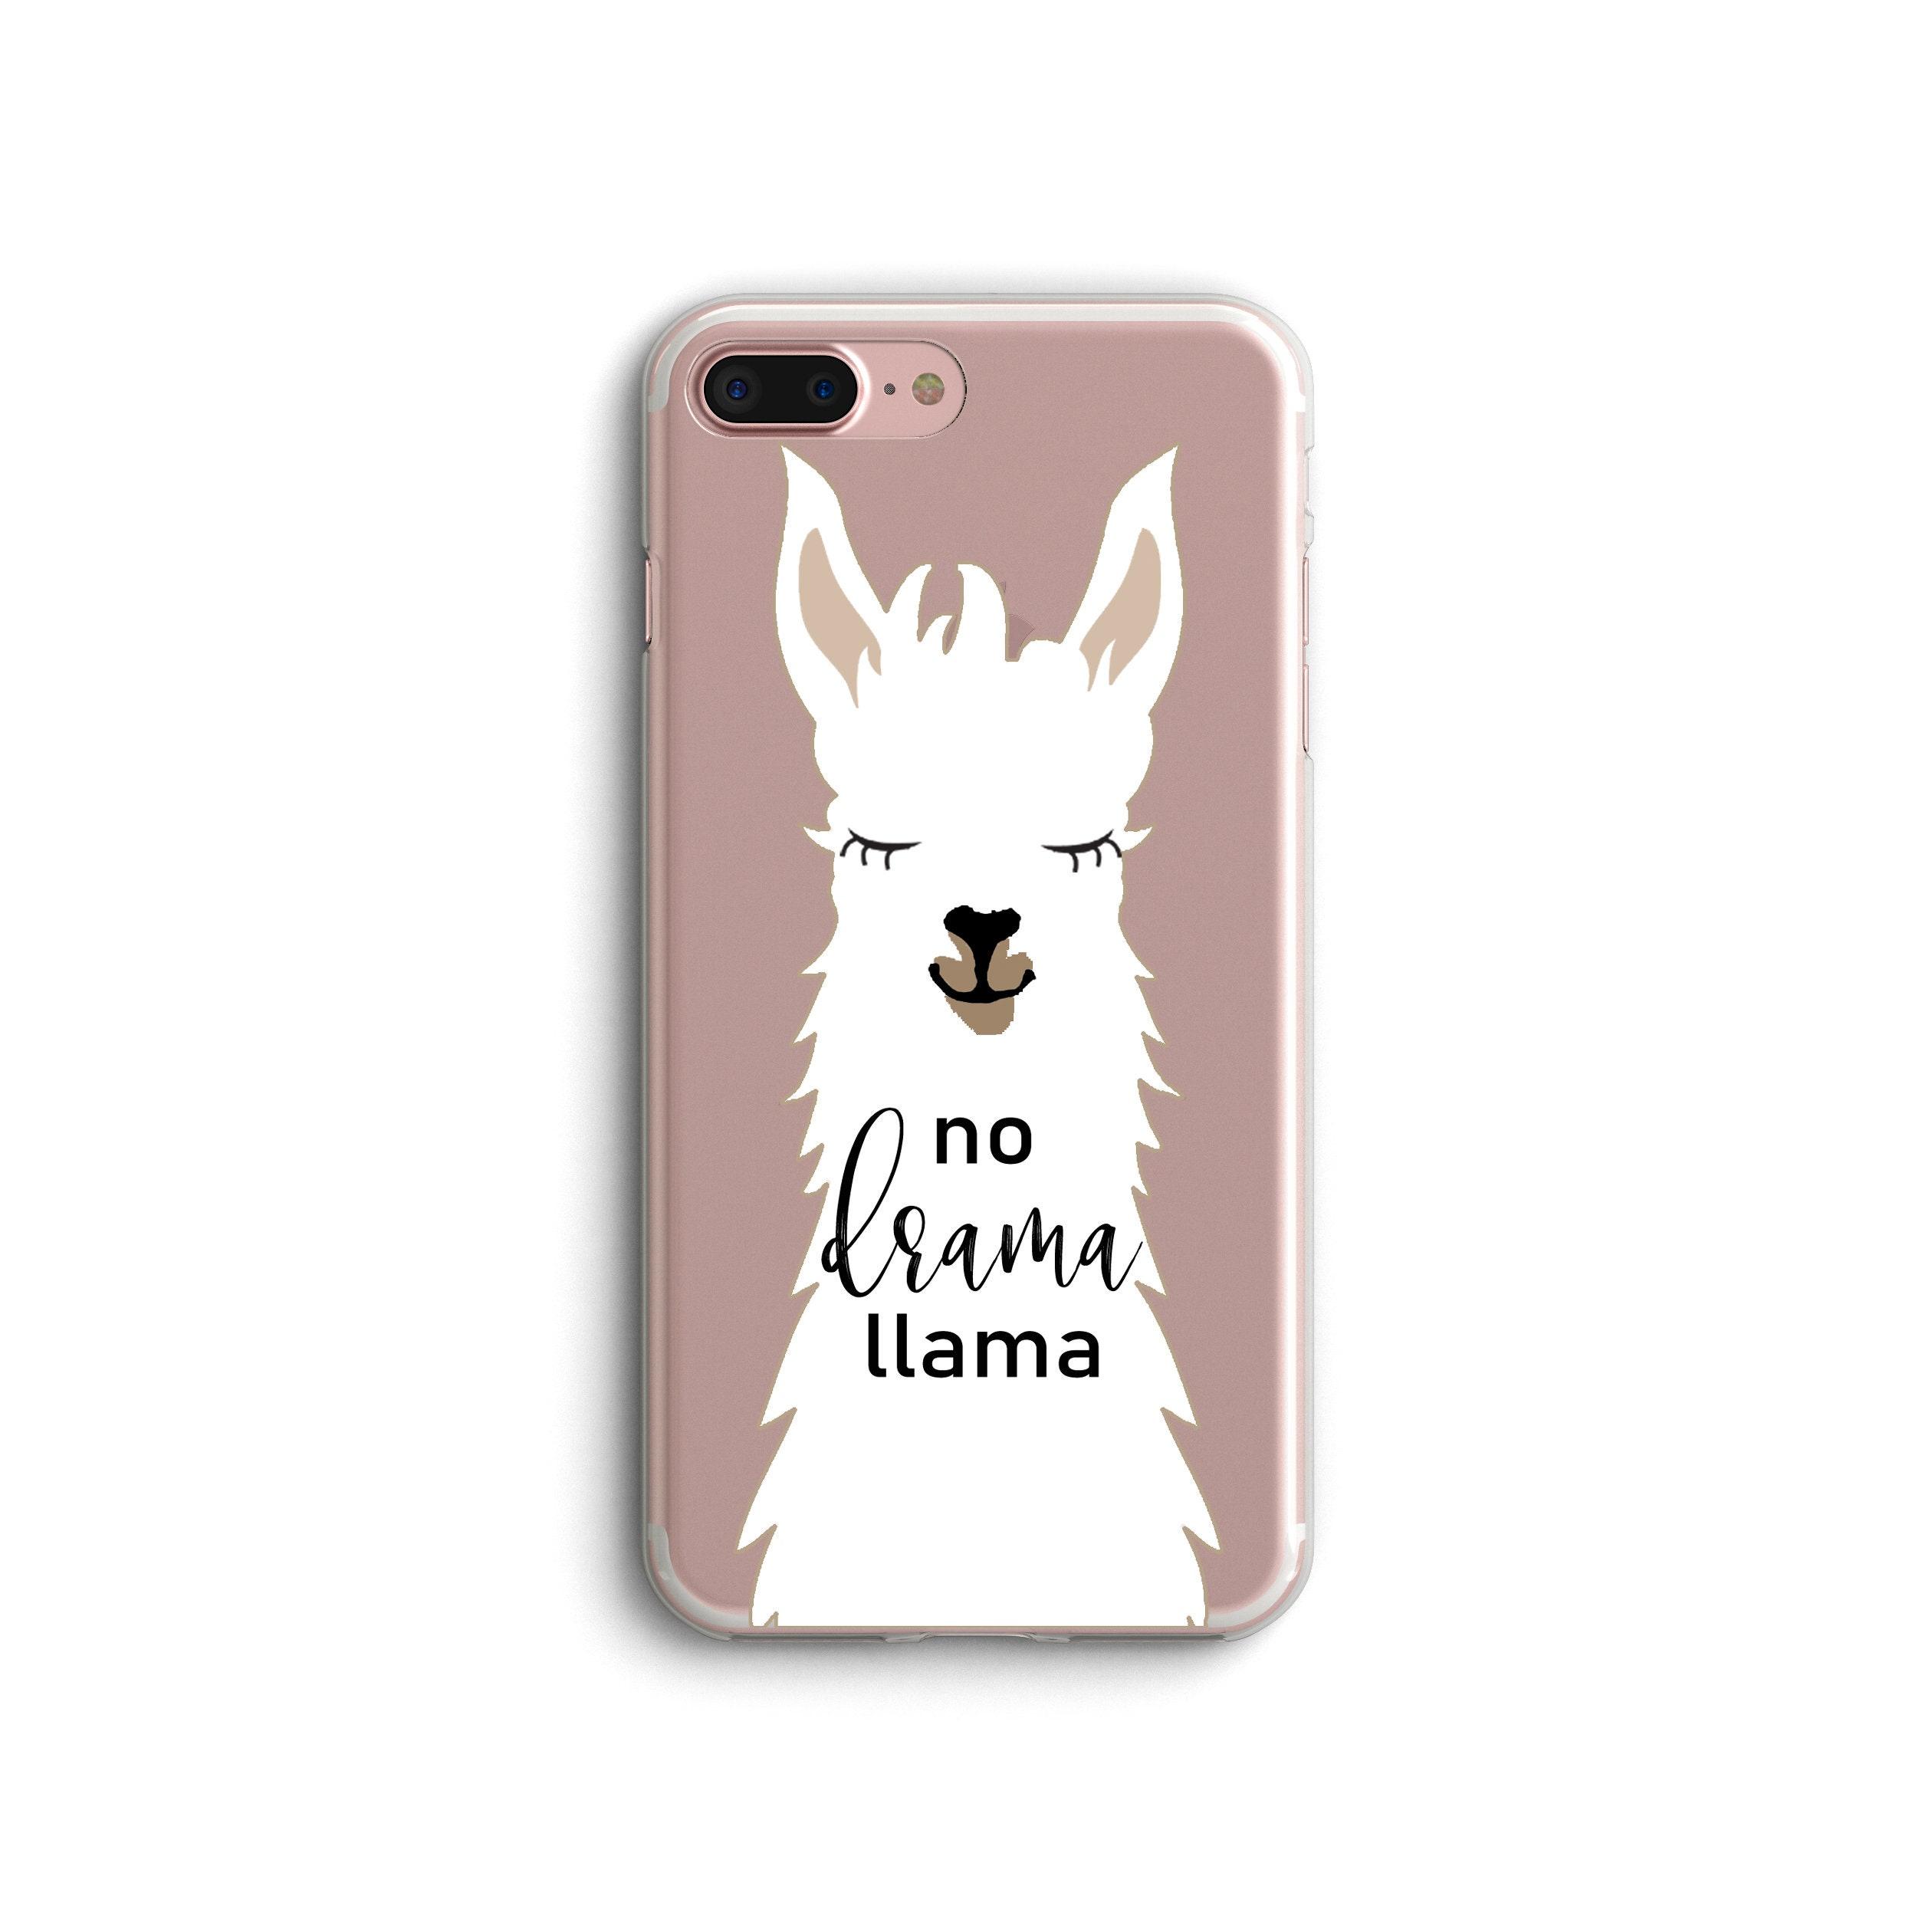 llama iphone xs case